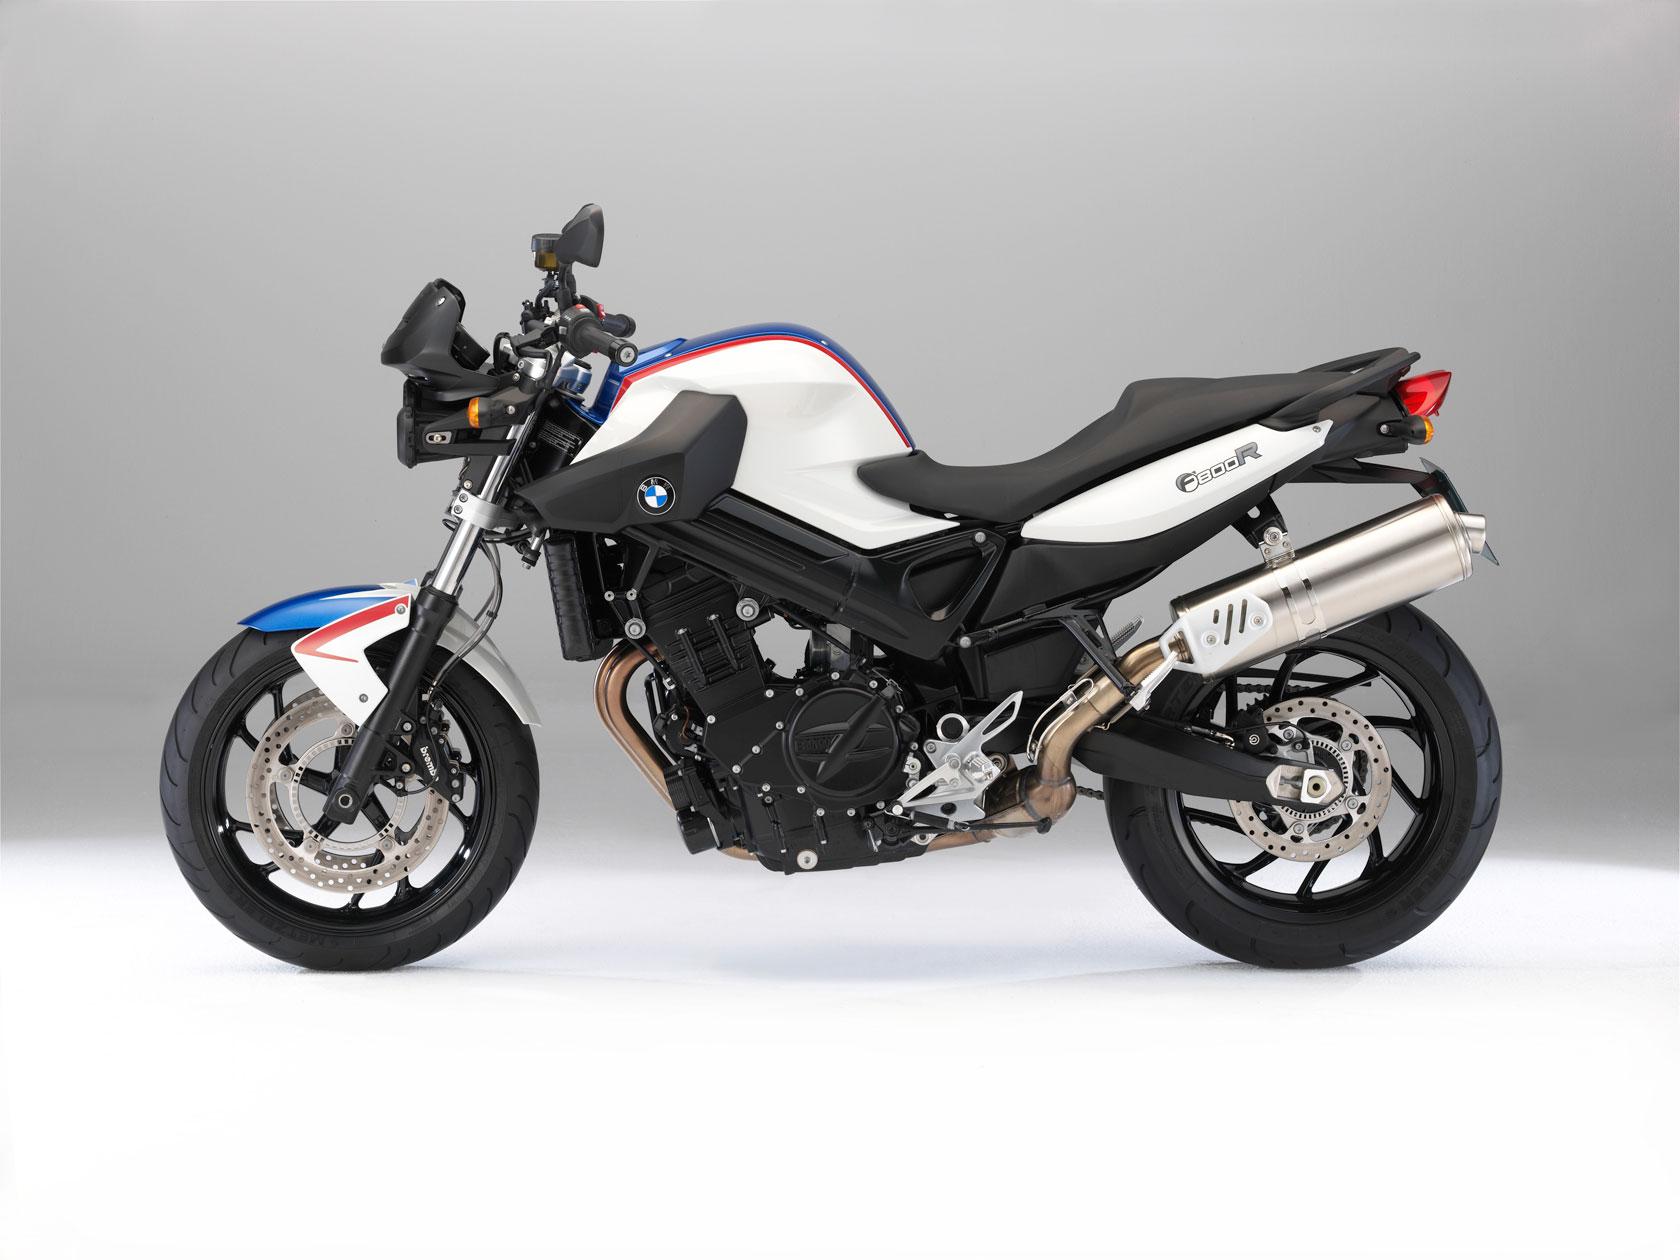 BMW F 800 R | Moto | Roadster - Andar de Moto